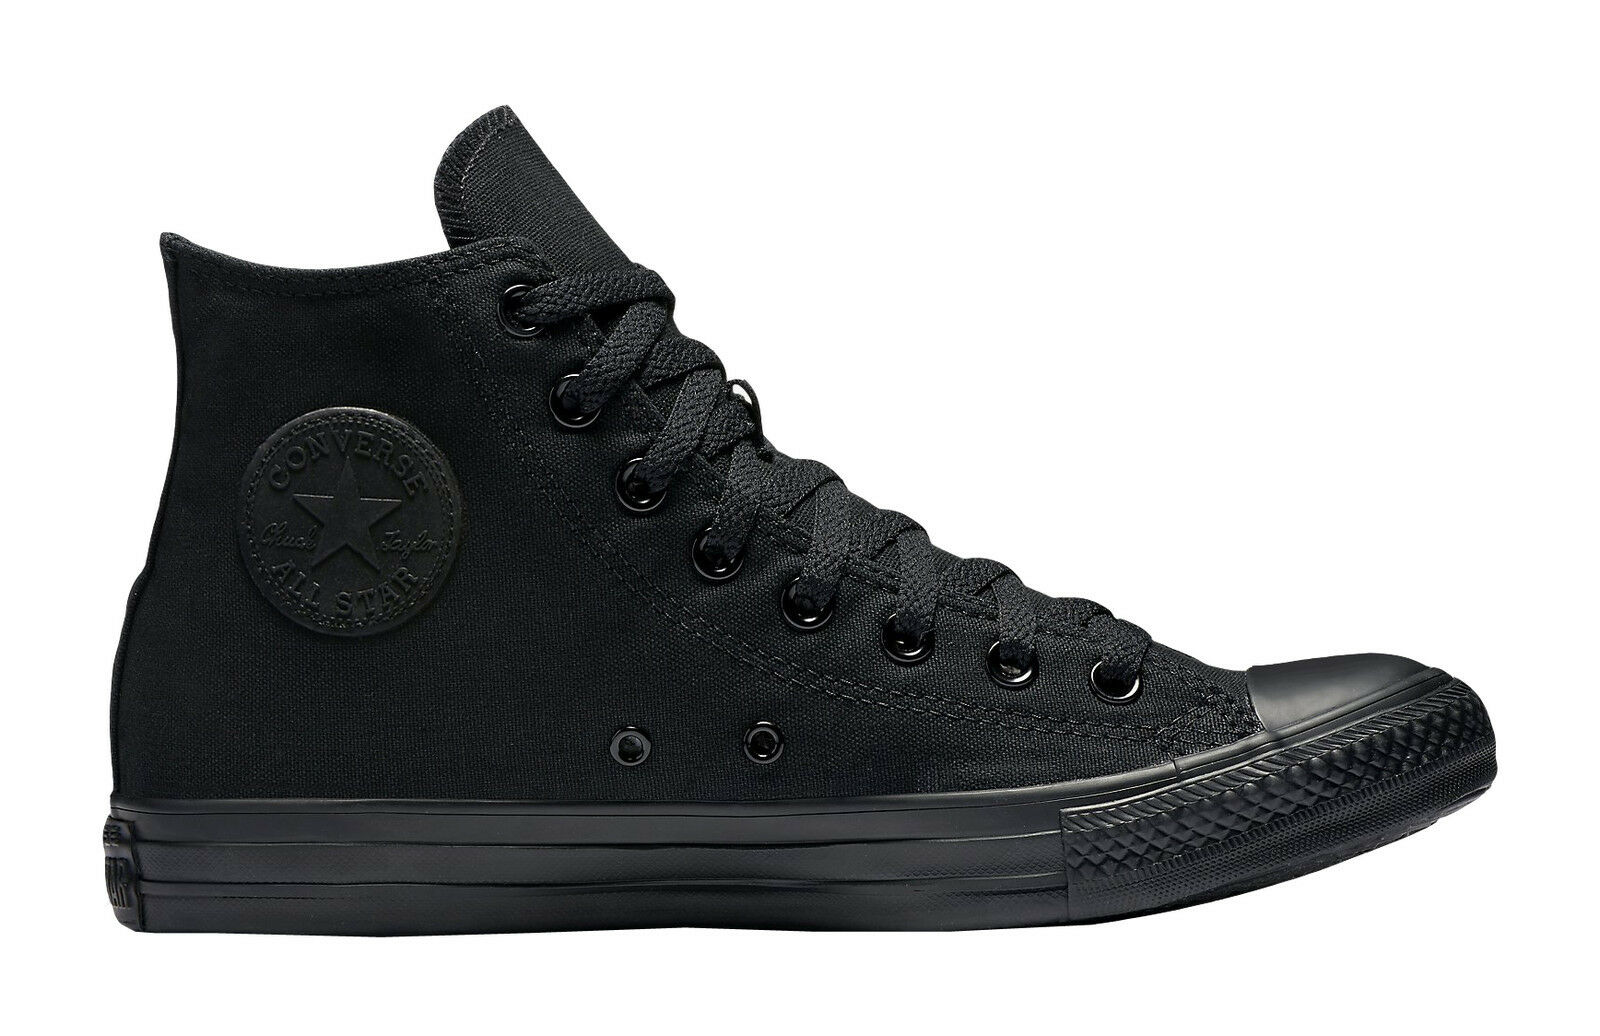 Converse All Star Chuck Taylor Shoe Black Mono Hi Top Canvas Women Sneaker M3310